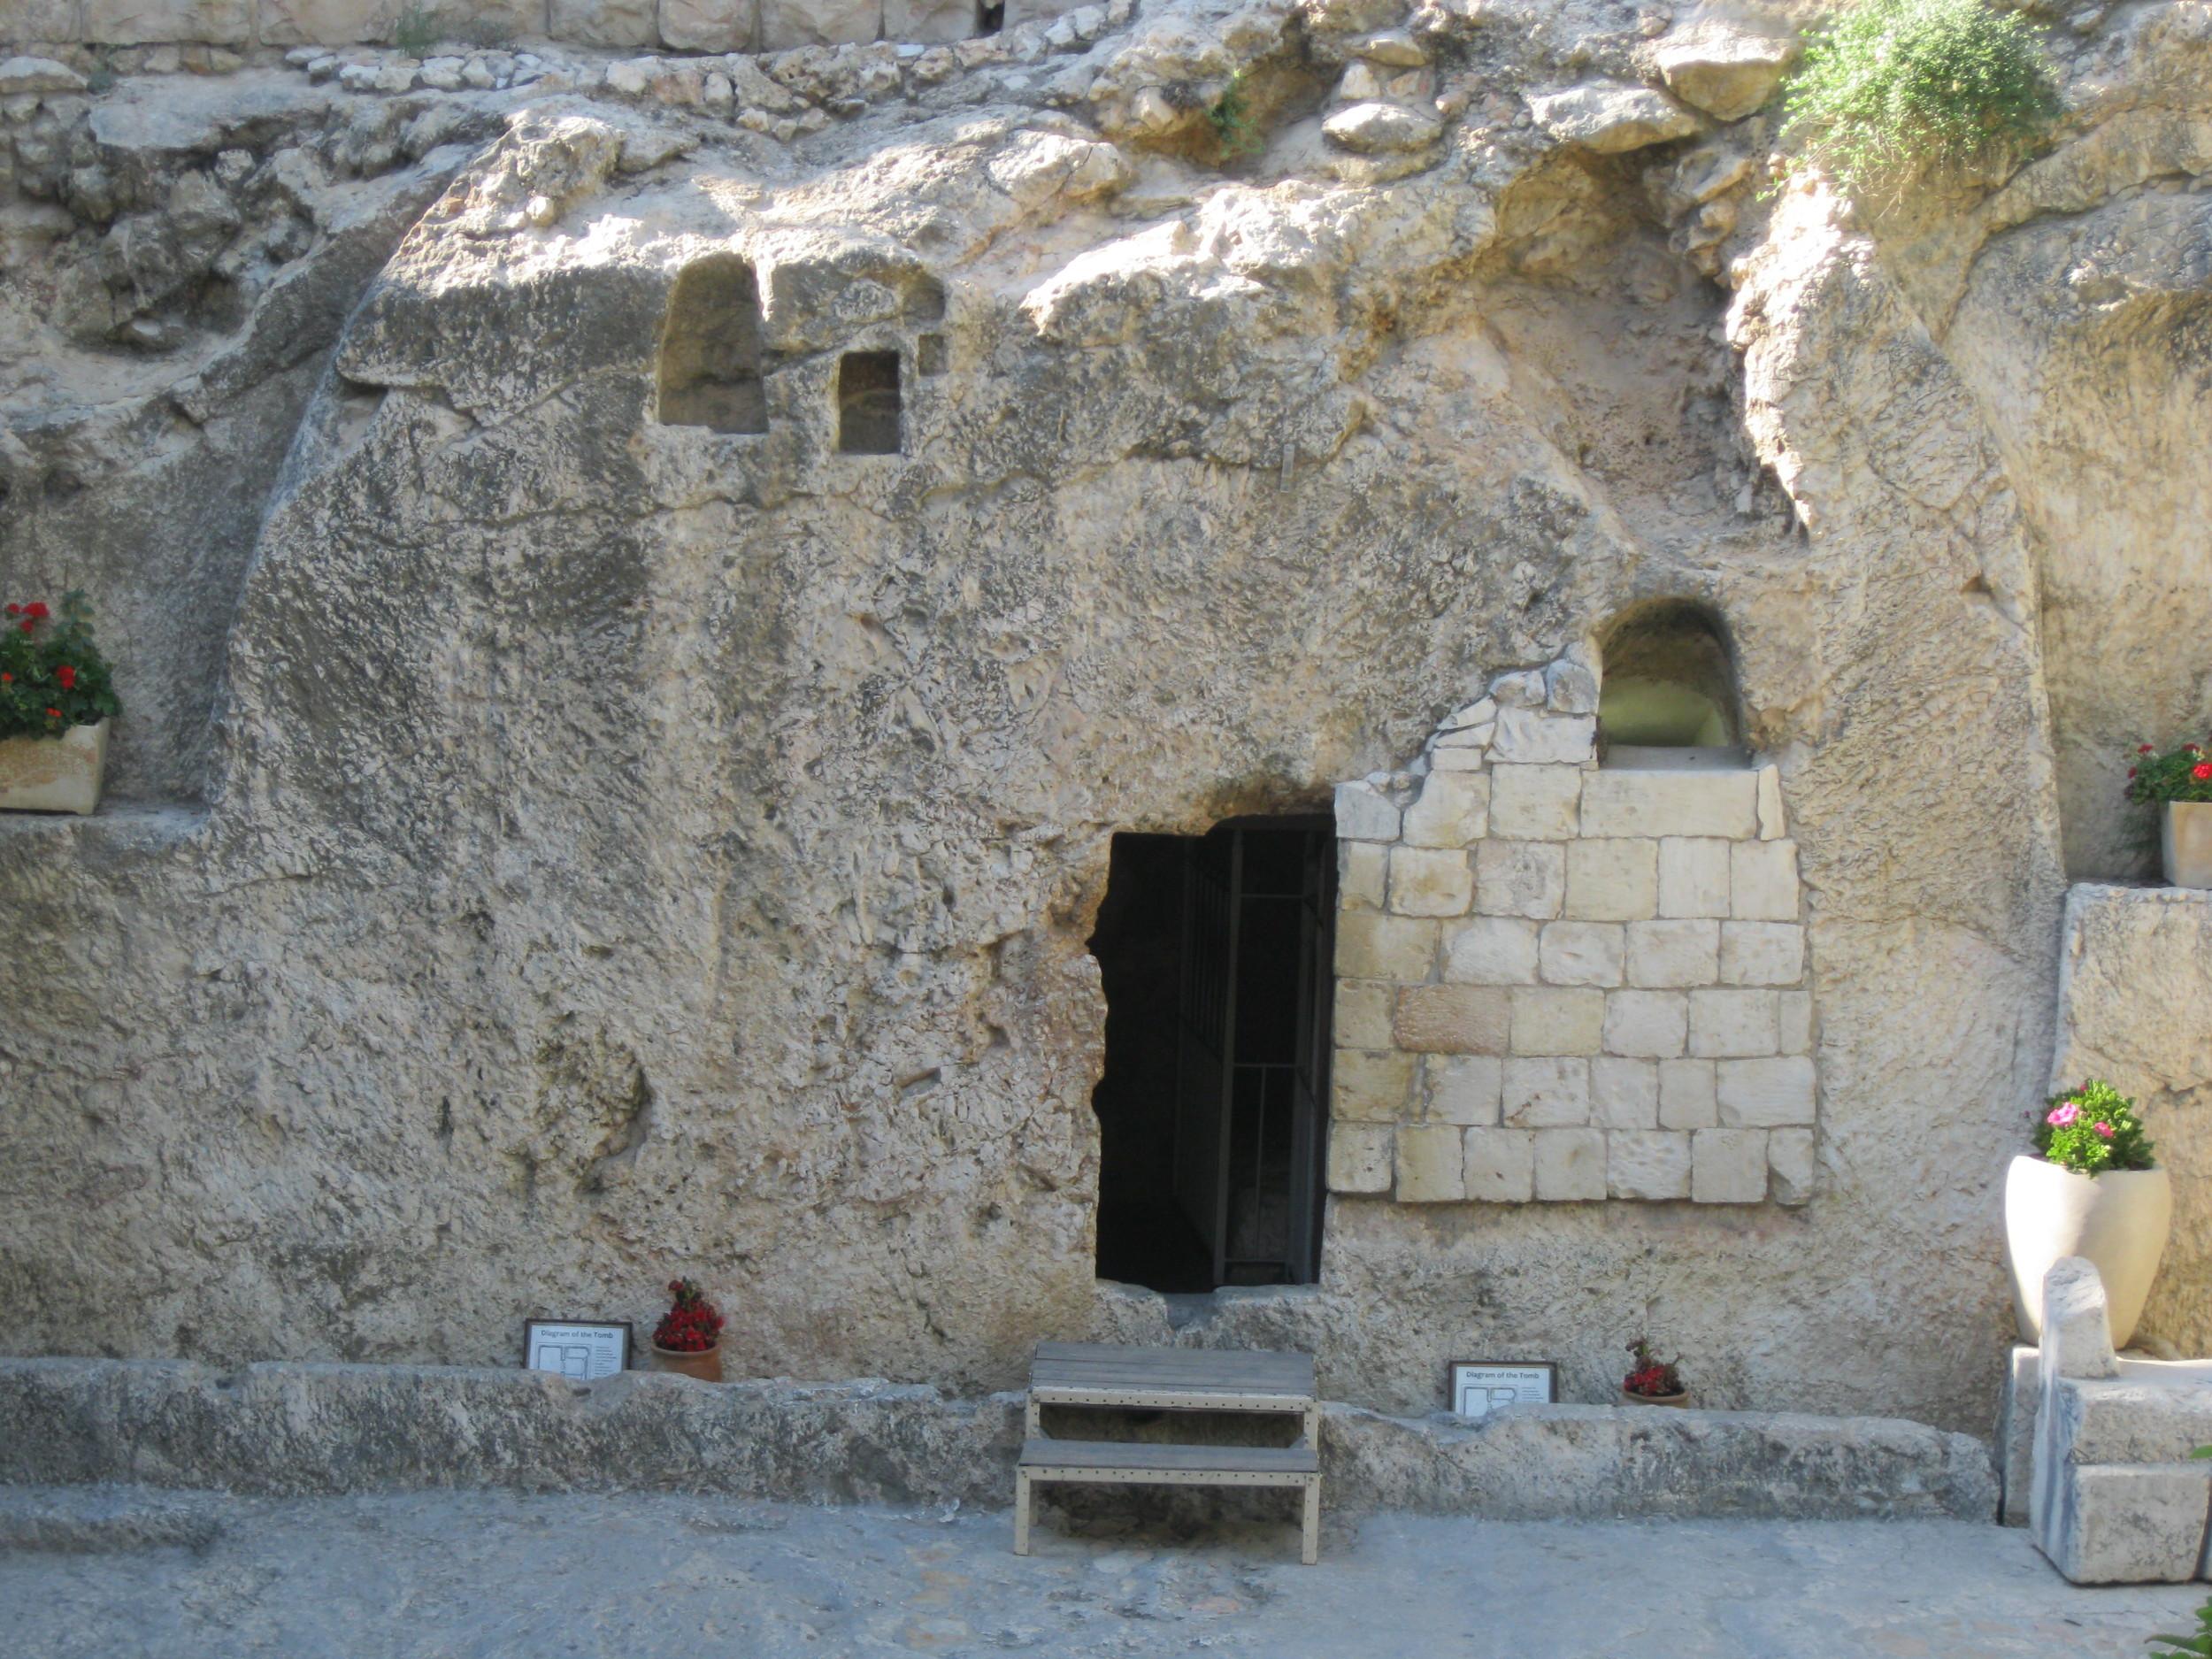 Tomb where Jesus was buried